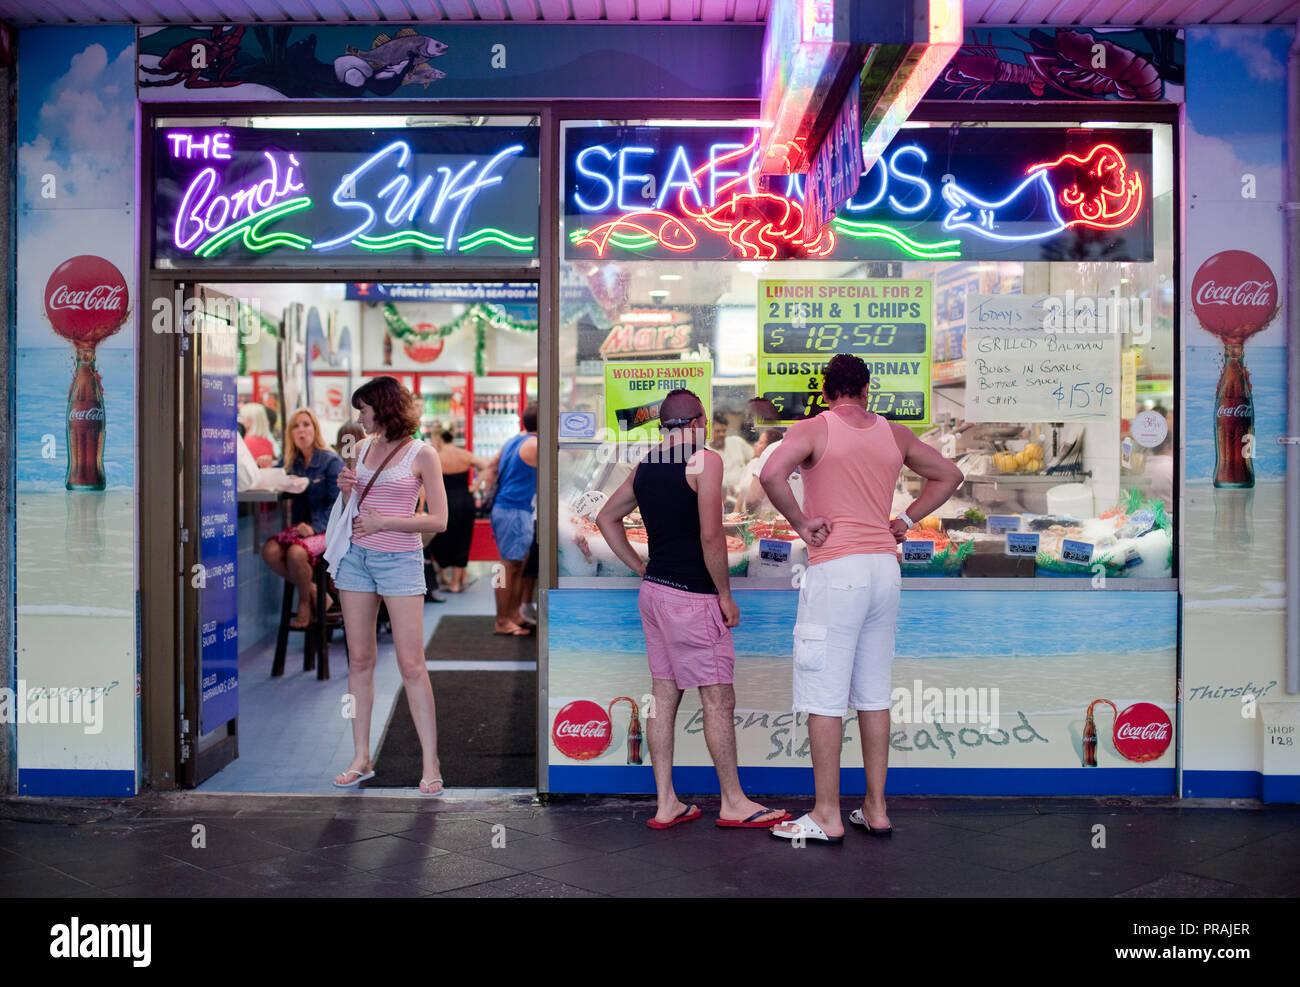 The Bondi Surf Seafoods fish & chippery on Campbell Parade, Sydney, Australia. - Stock Image